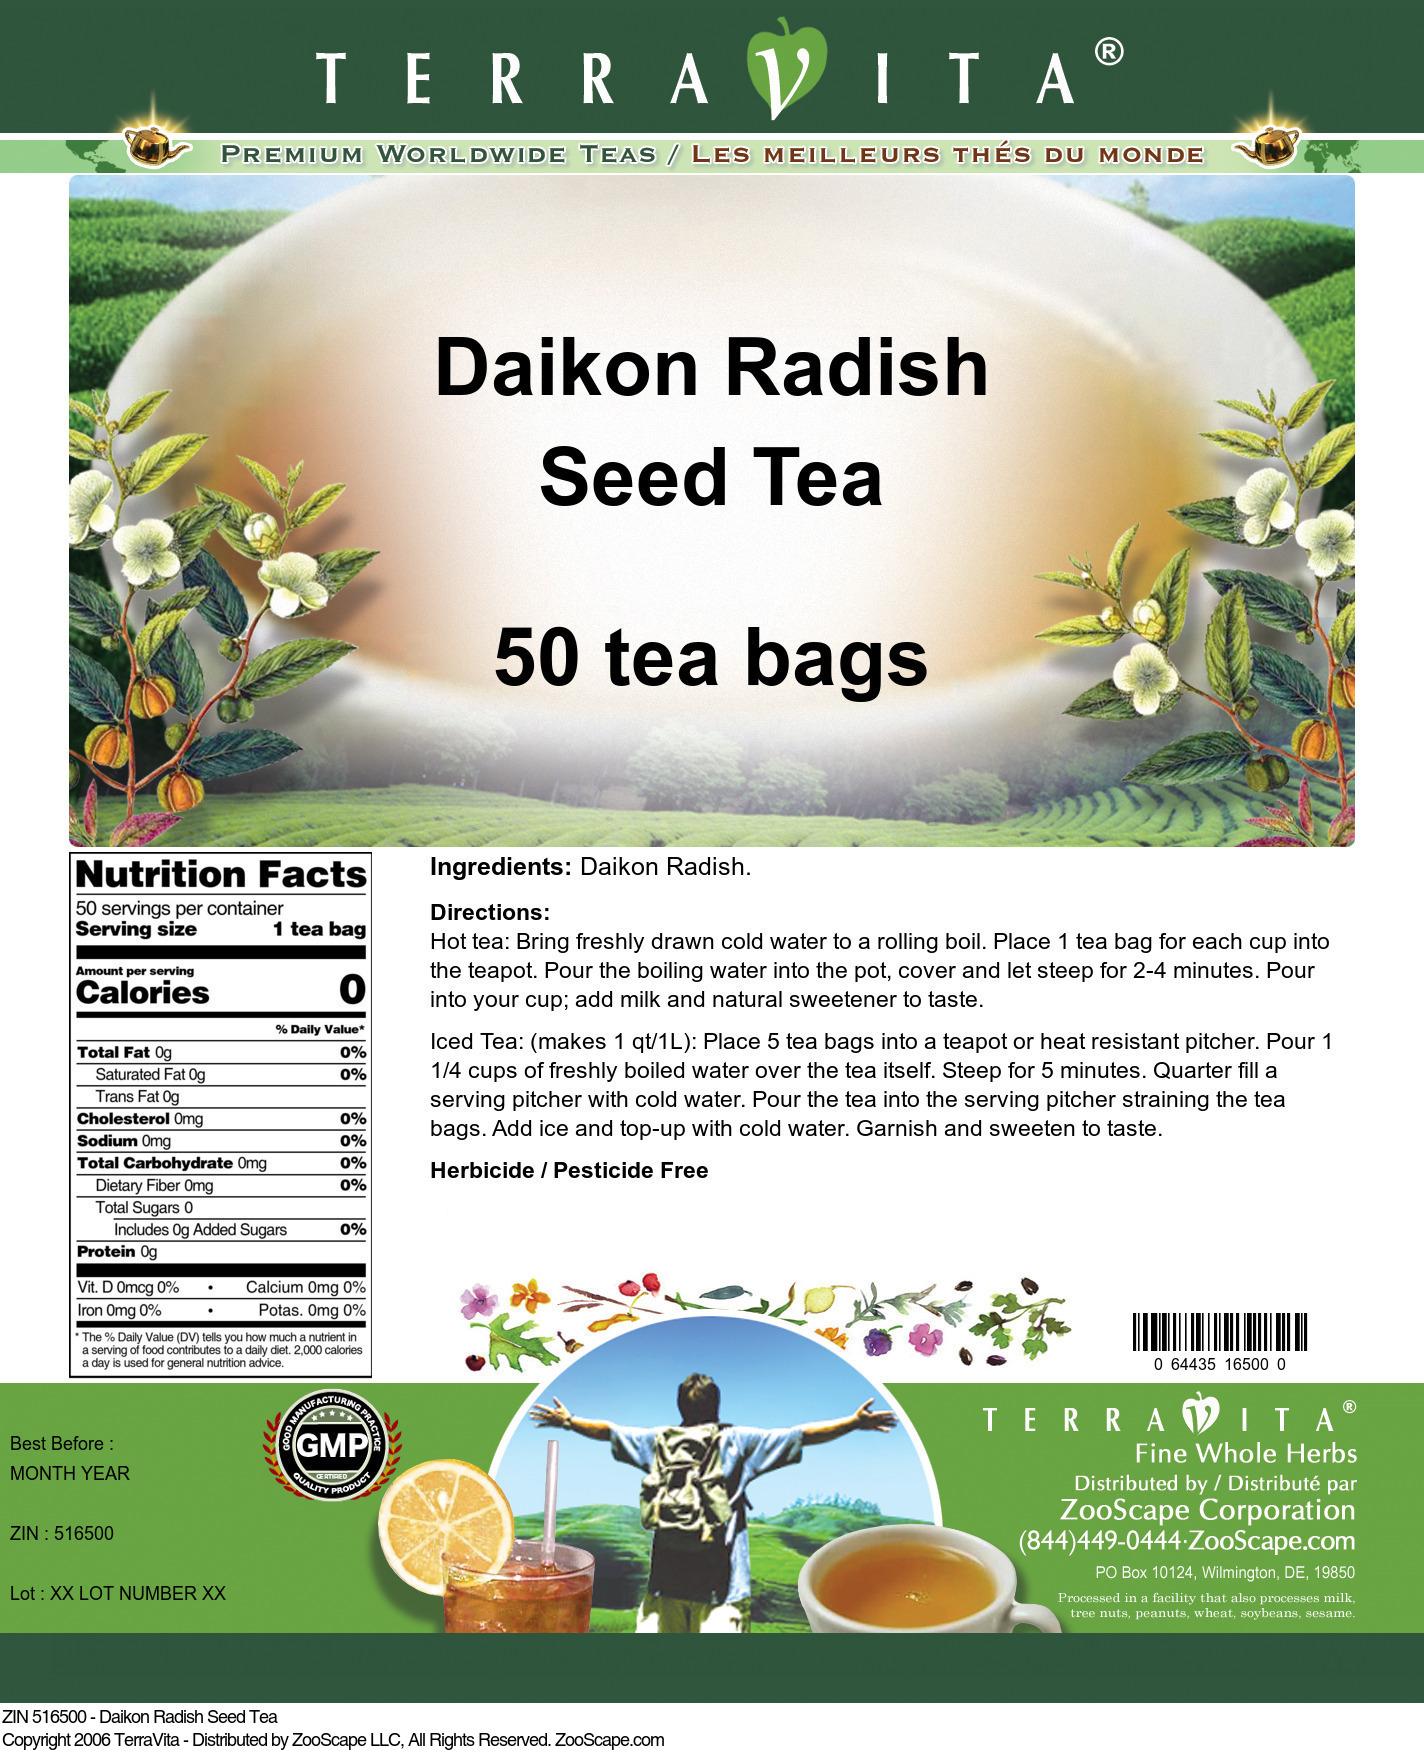 Daikon Radish Seed